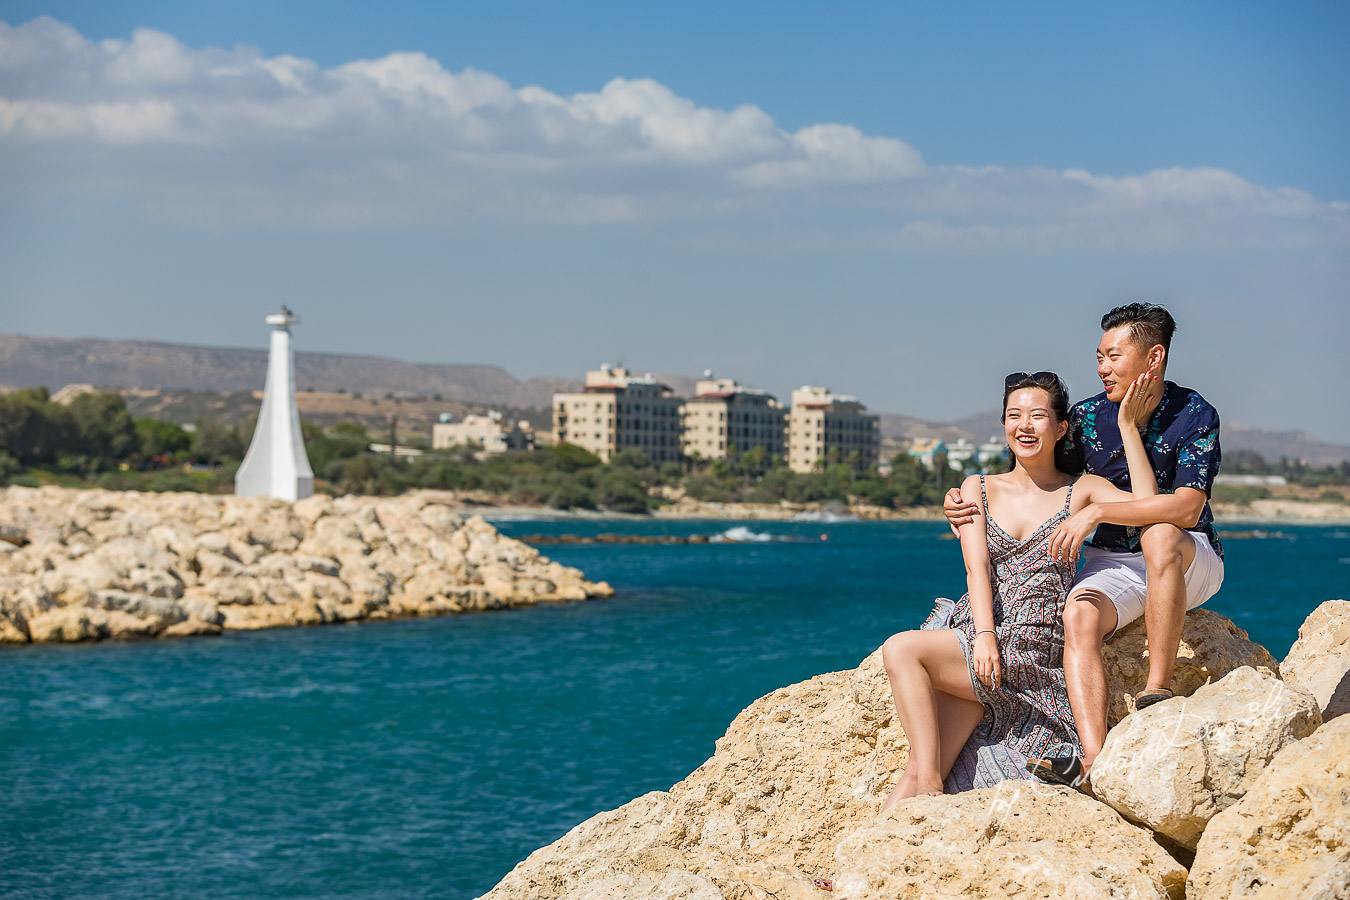 Beautiful moments captured by Cristian Dascalu in Zigy, Cyprus.